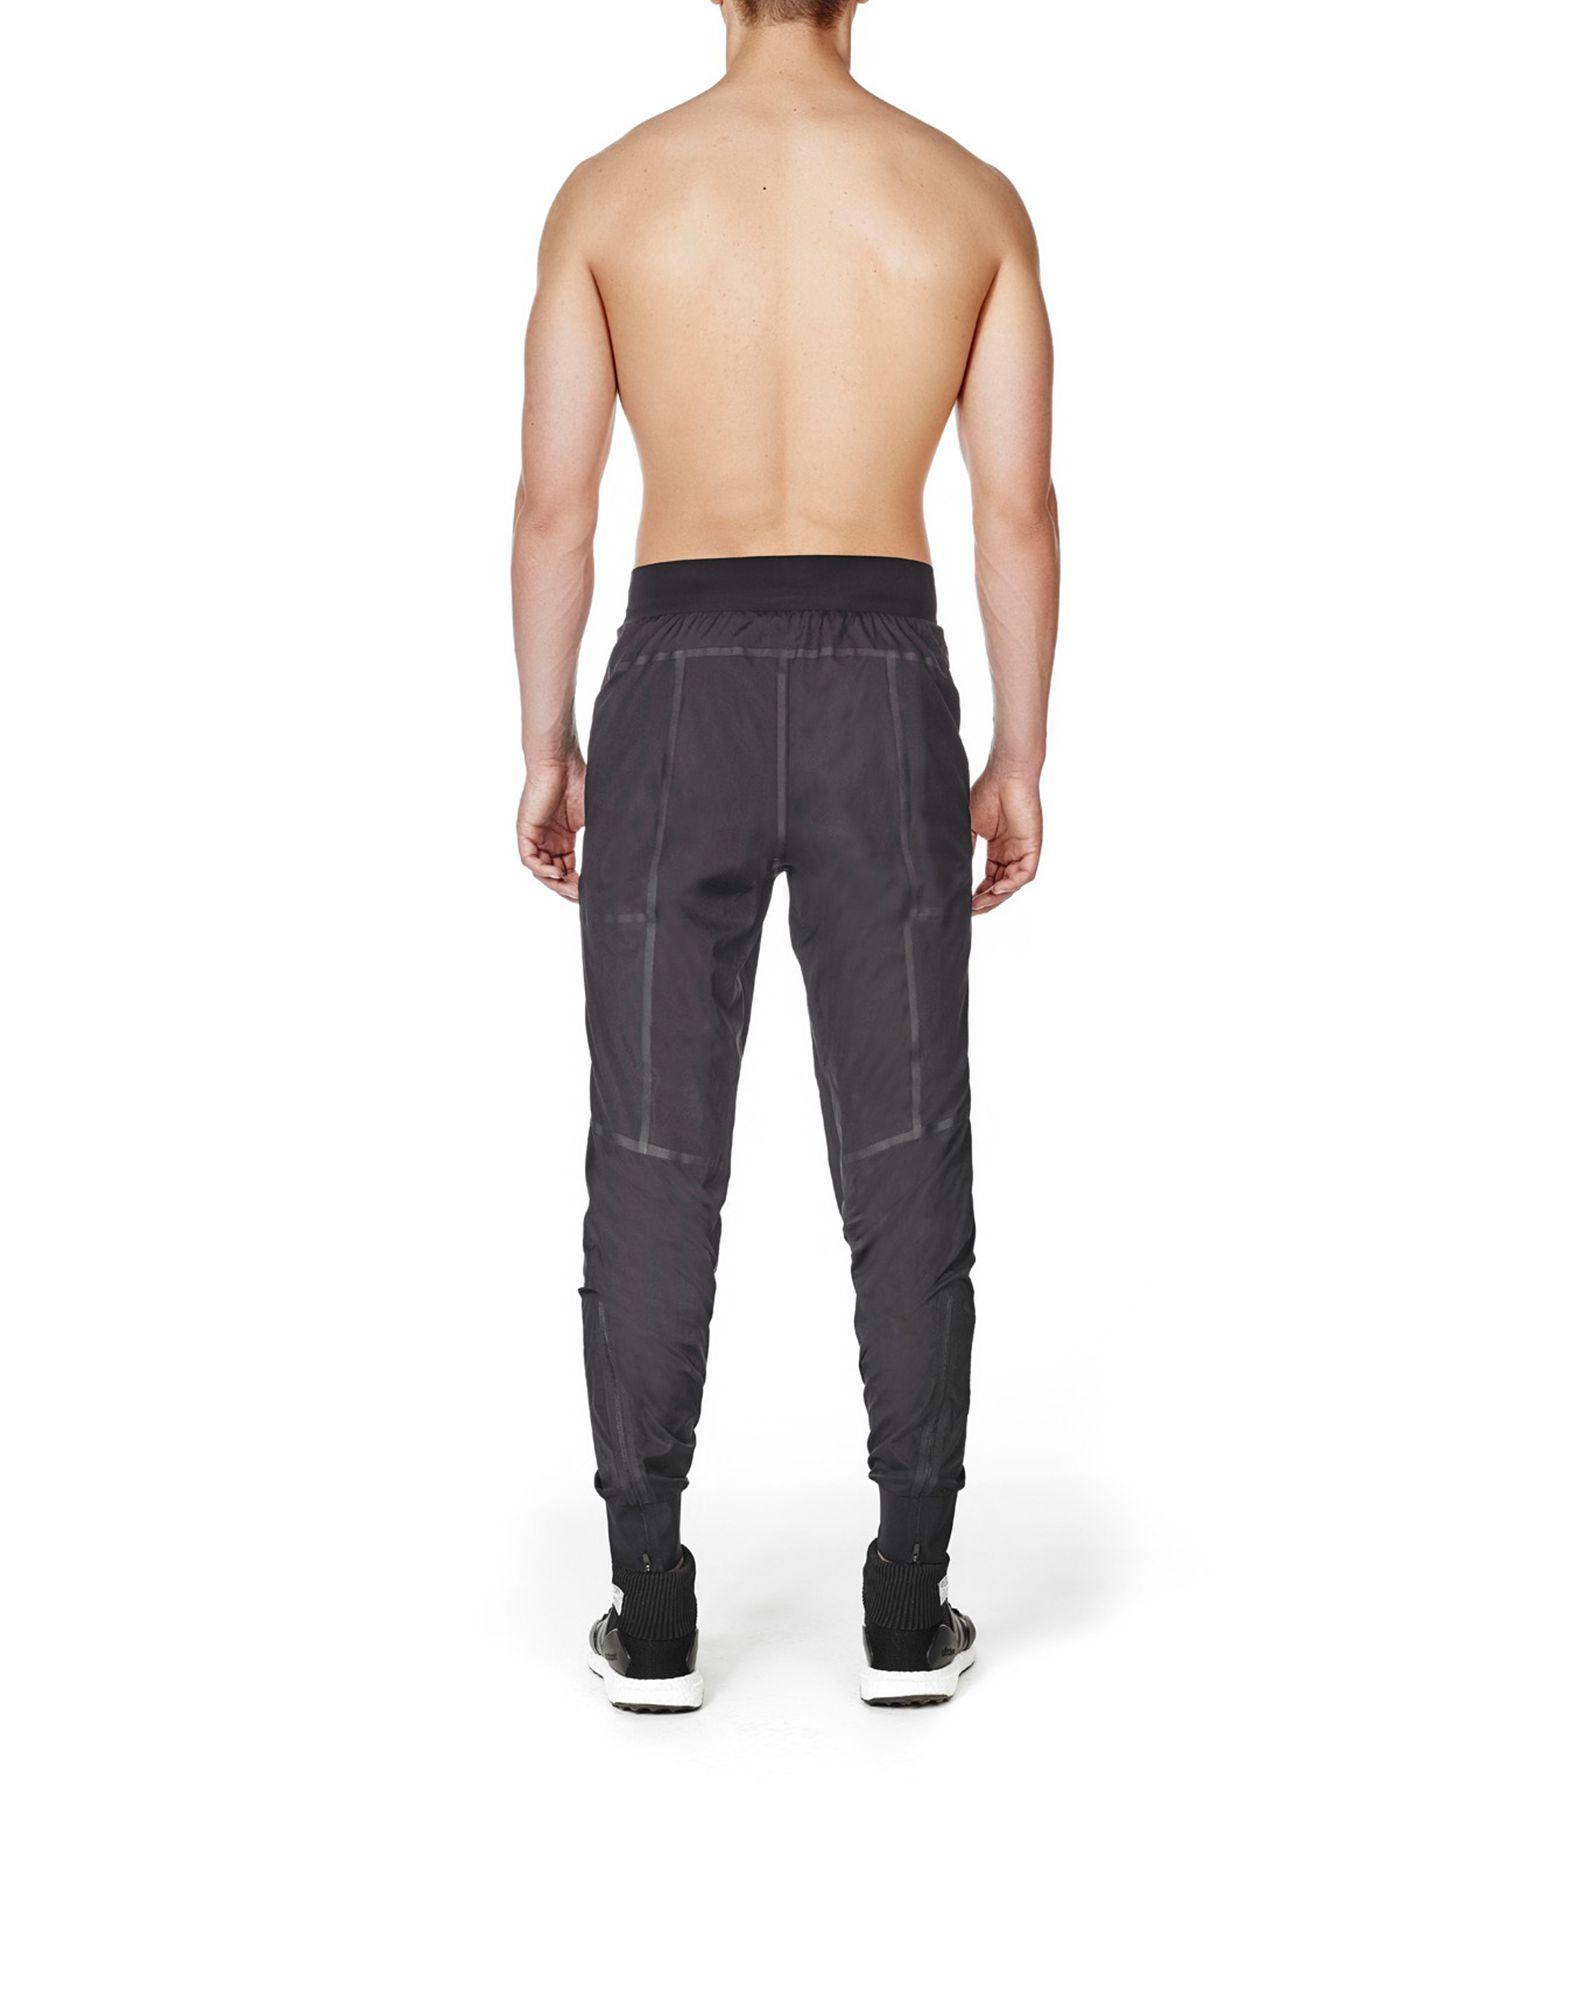 ... Y-3 SPORT ULTRALIGHT PANT PANTS man Y-3 adidas ...